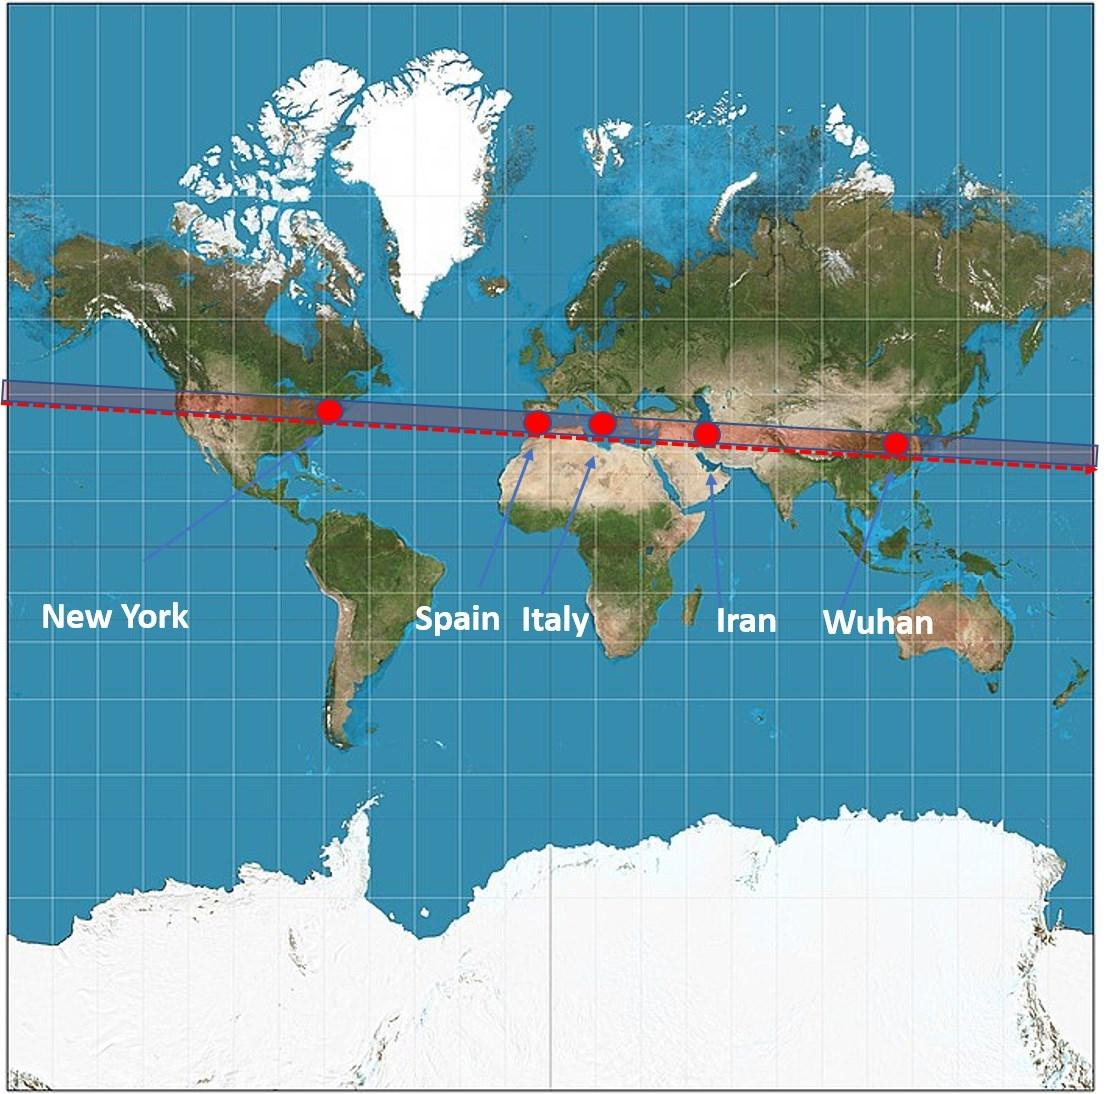 40th parallel line and coronavirus